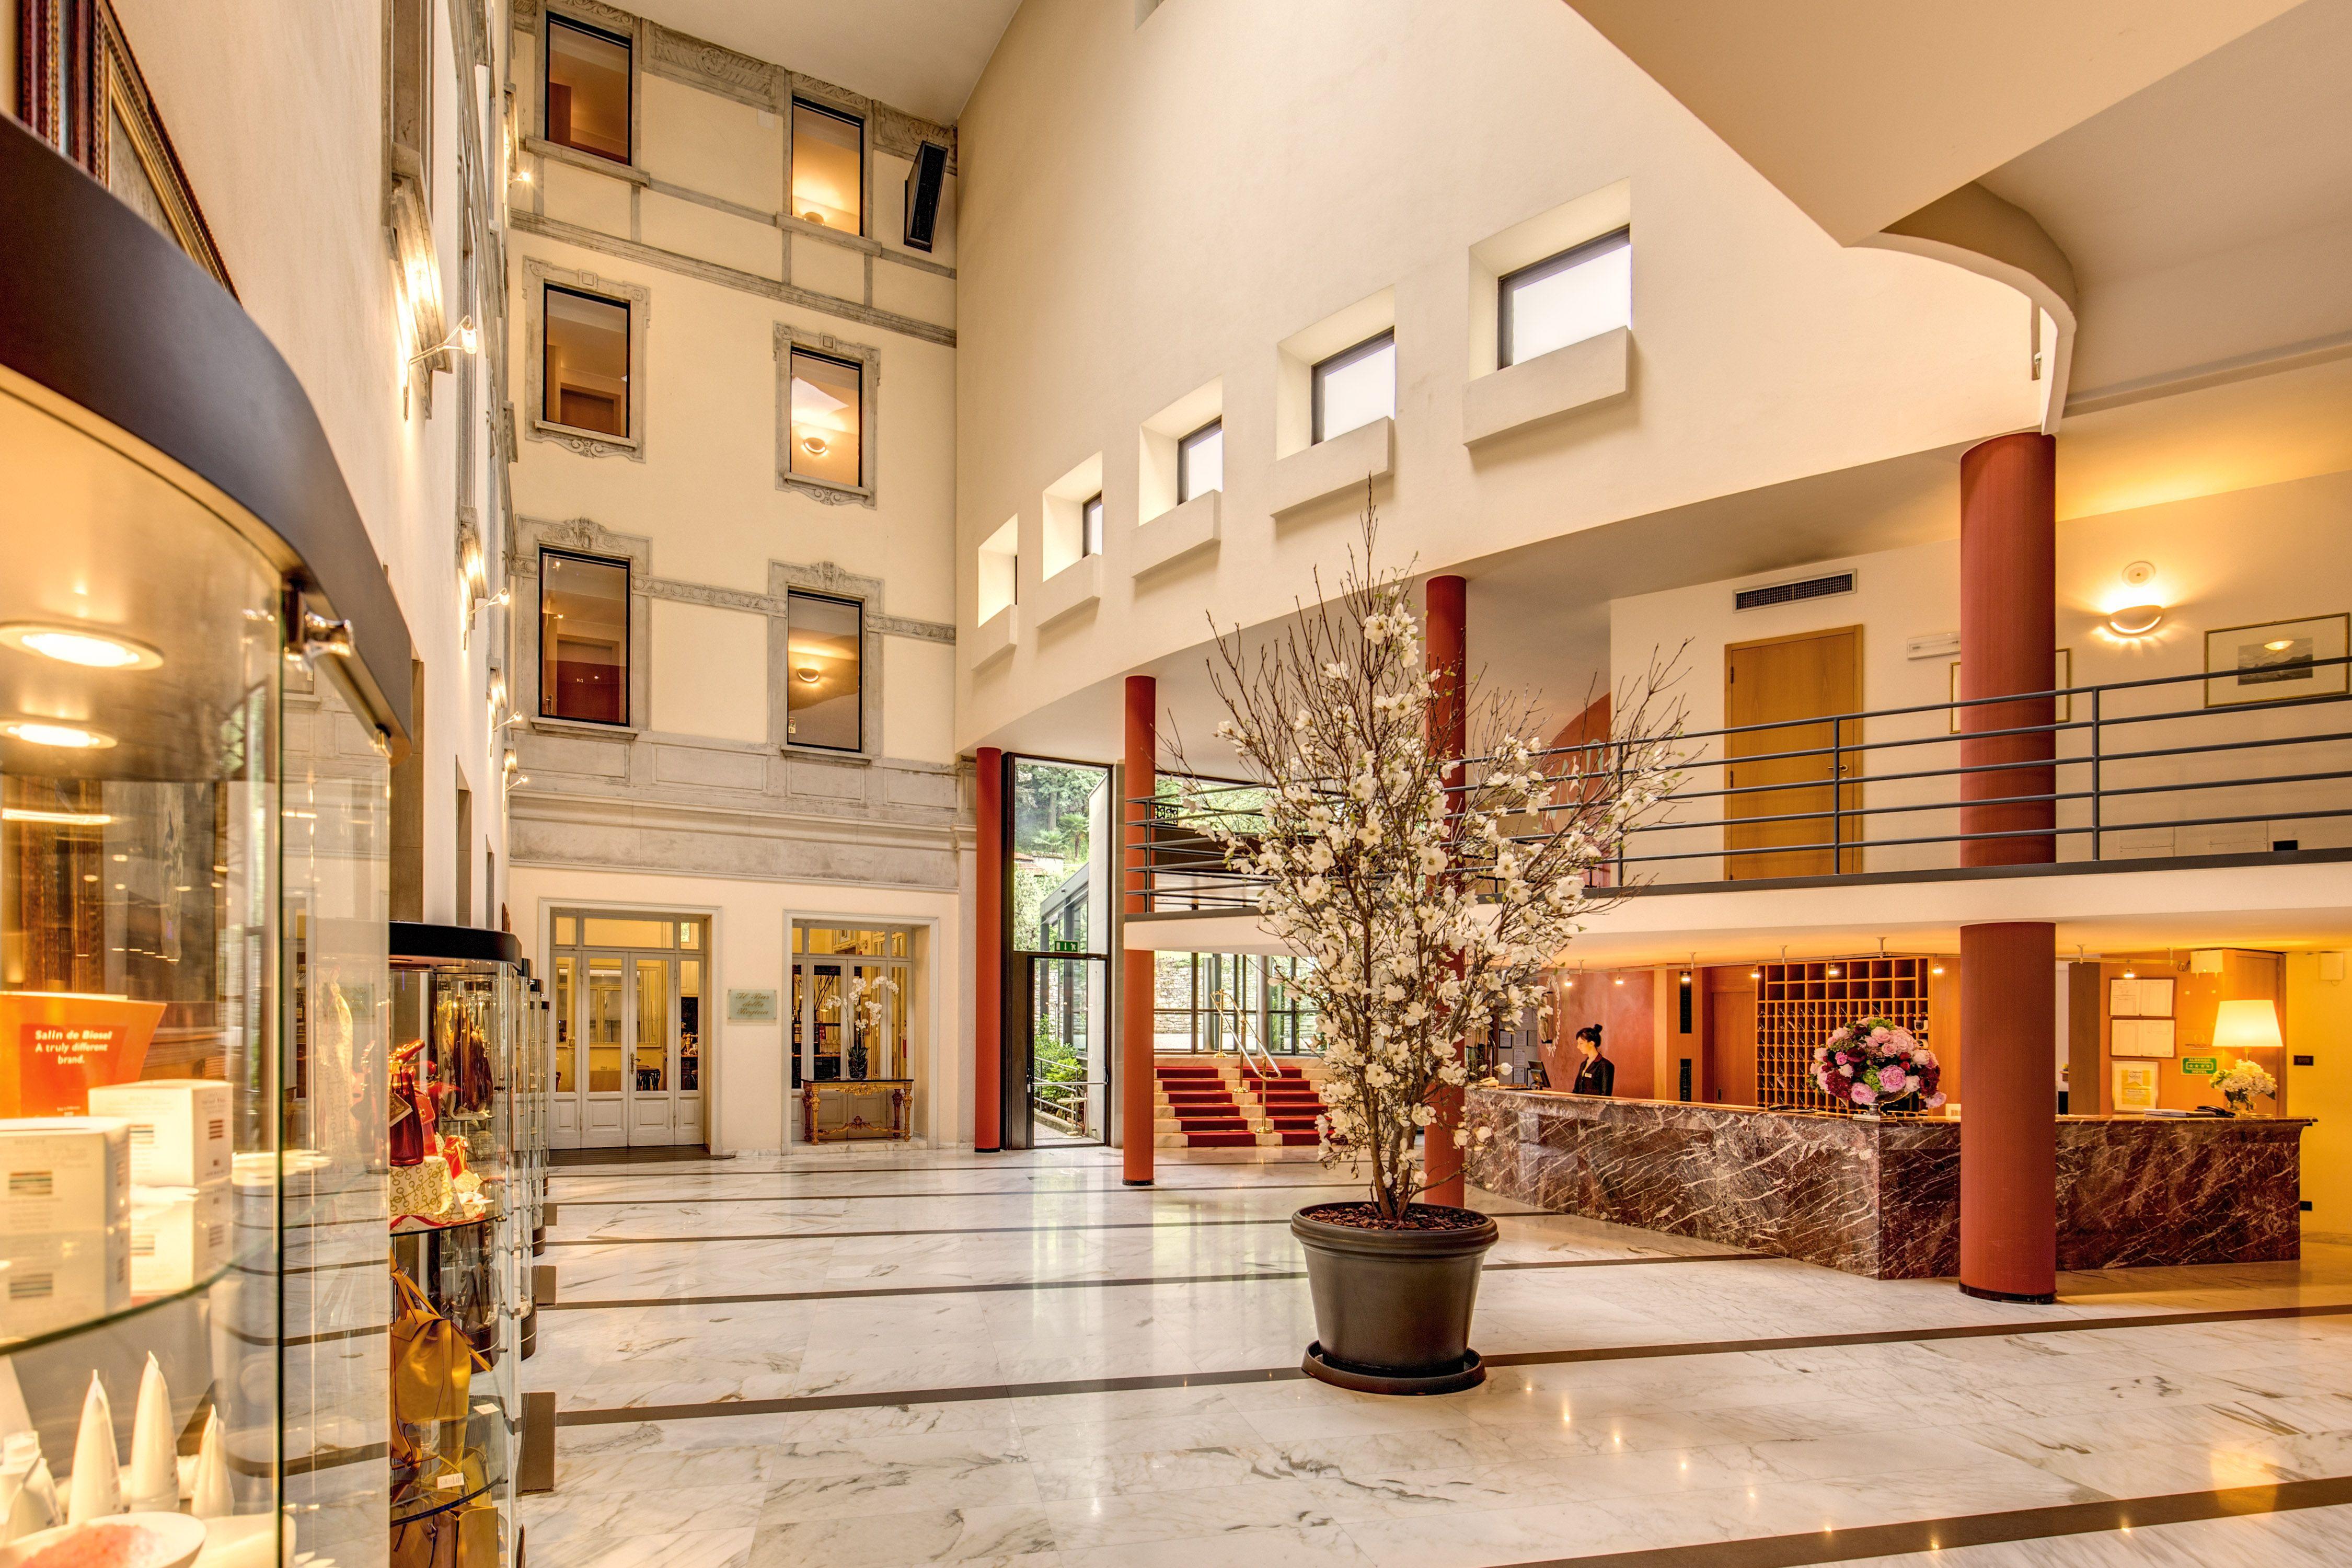 Pin di grand hotel imperiale su grand hotel imperiale_lake